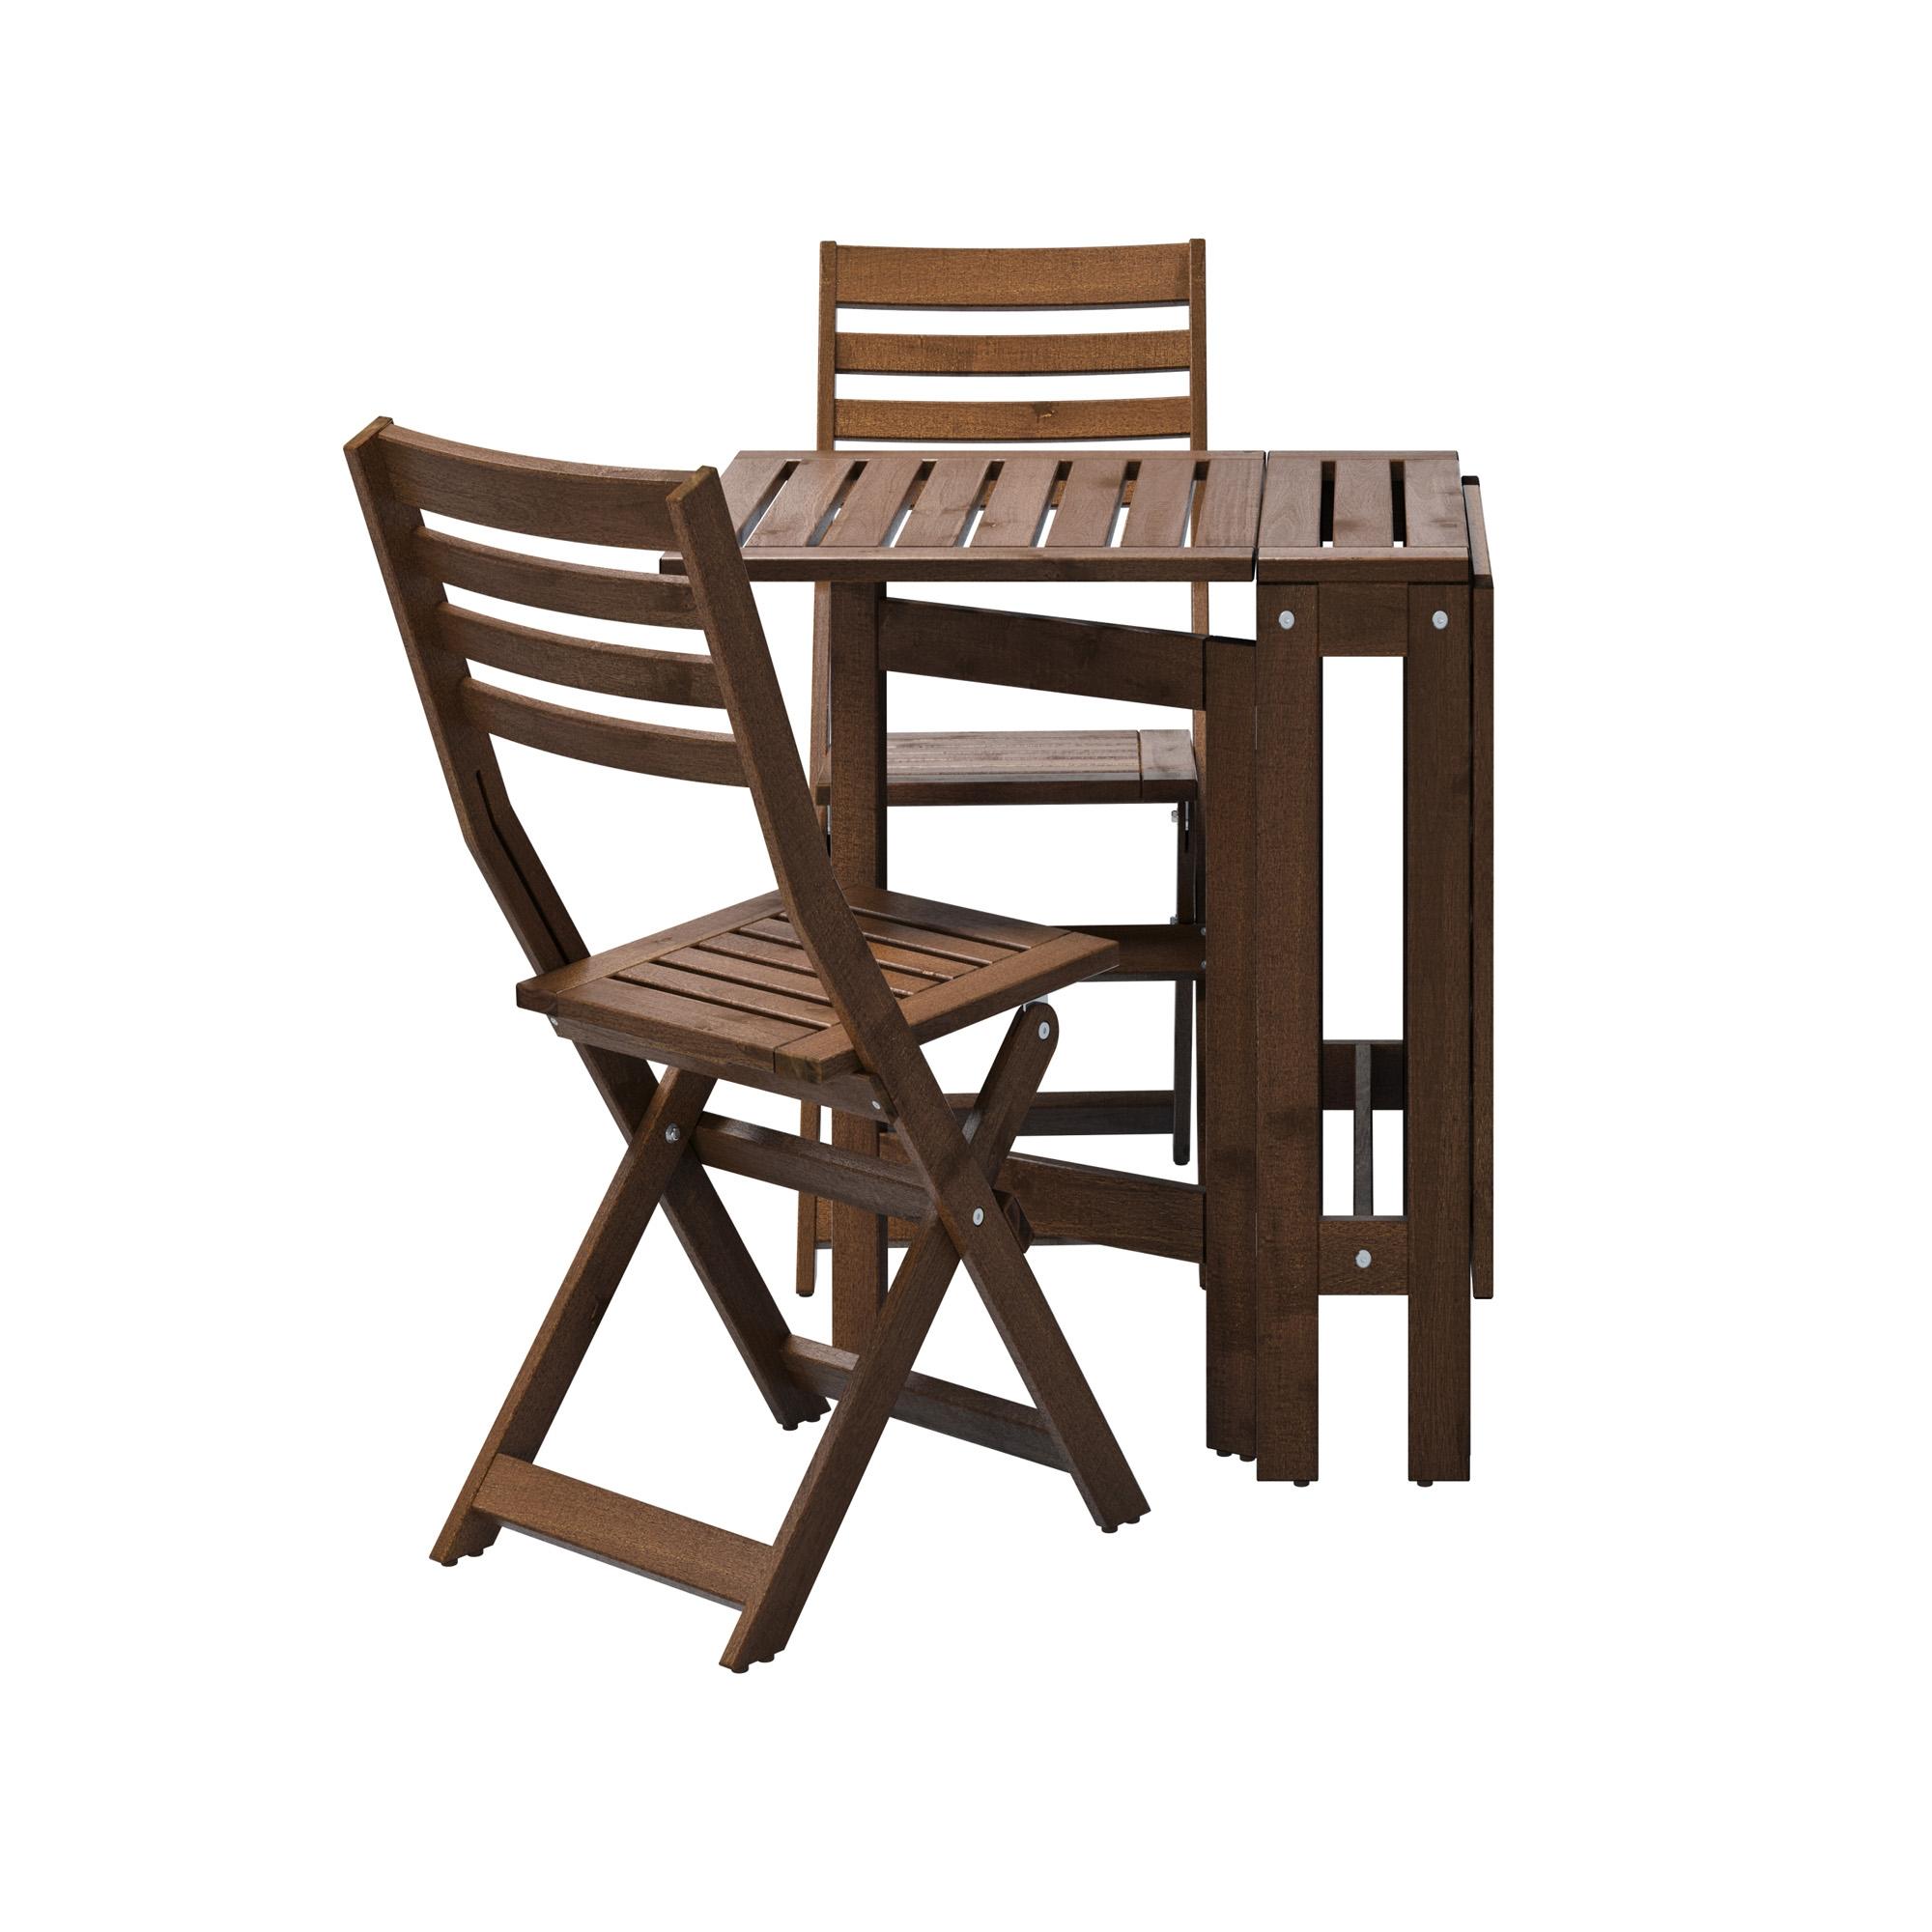 Pplar mesa 2 sillas plegables exterior - Sillas plegables ikea ...